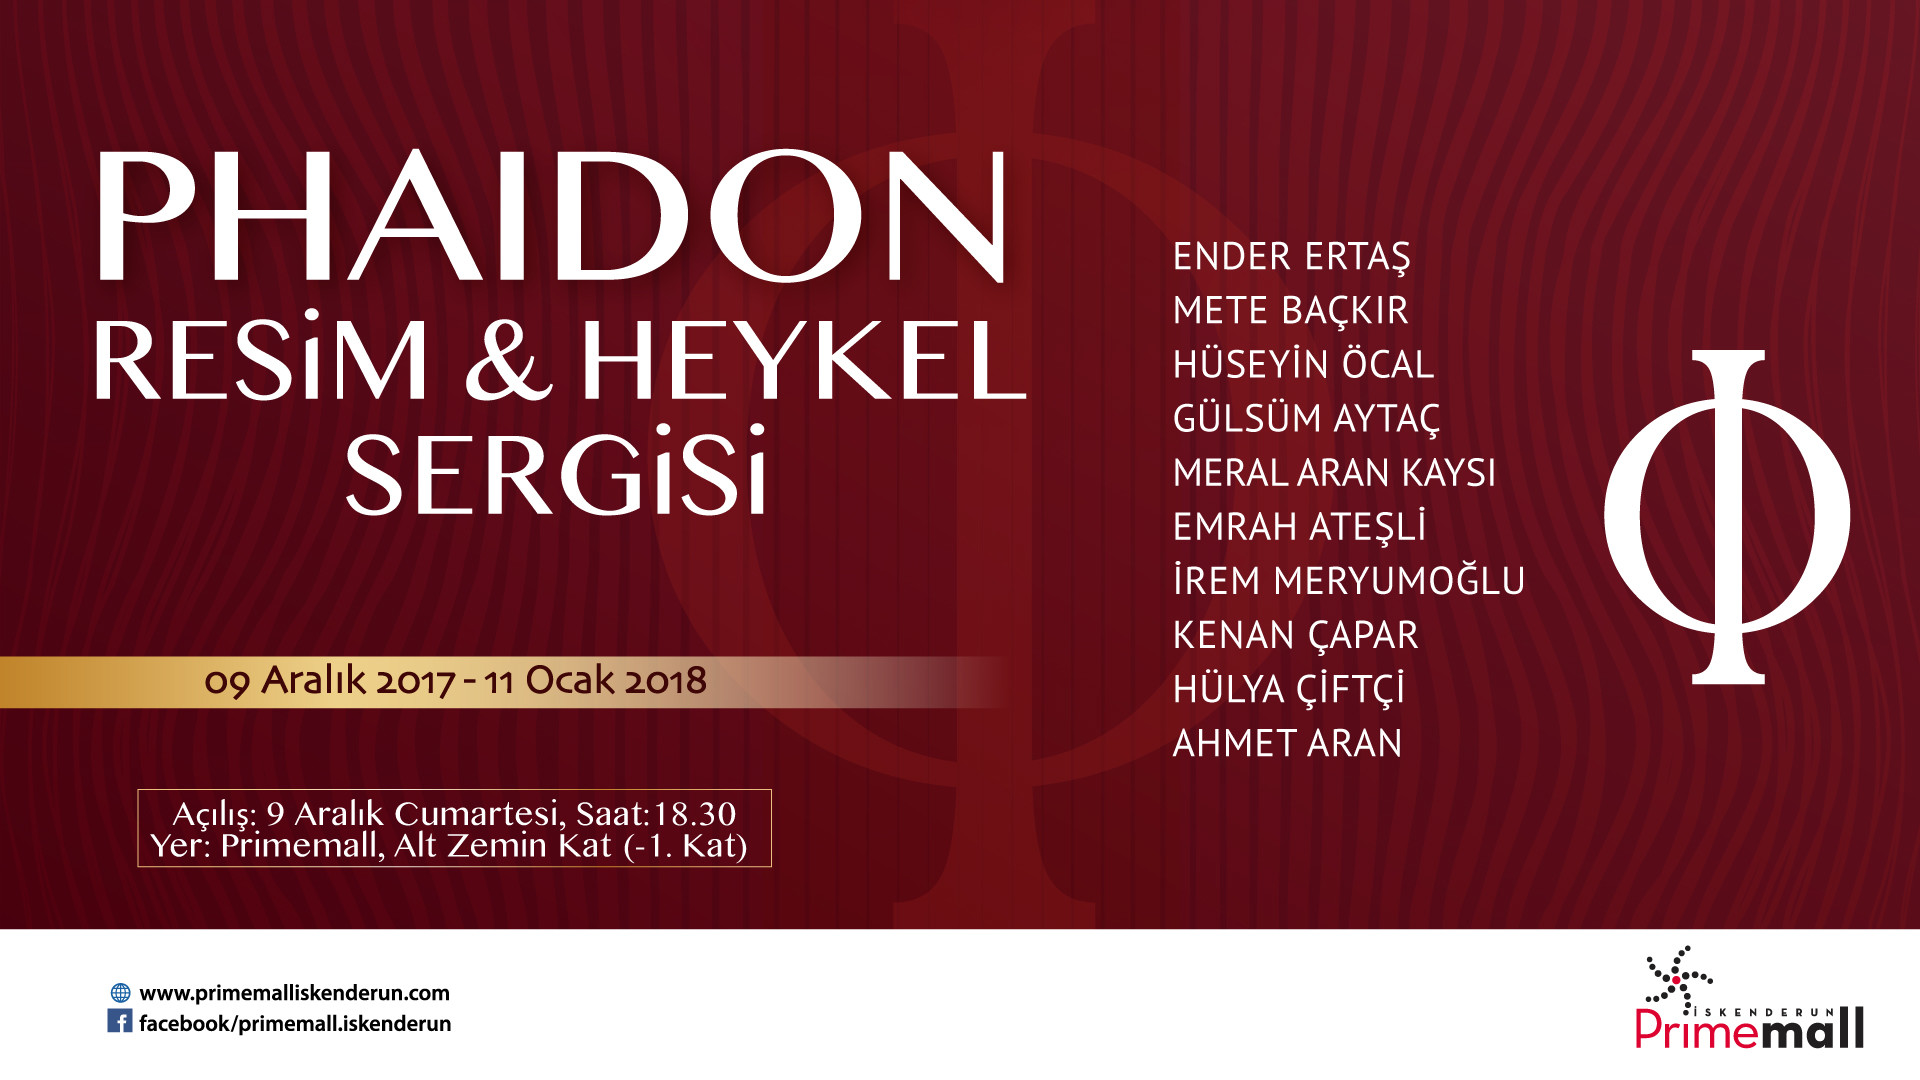 Phaidon Resim & Heykel Sergisi